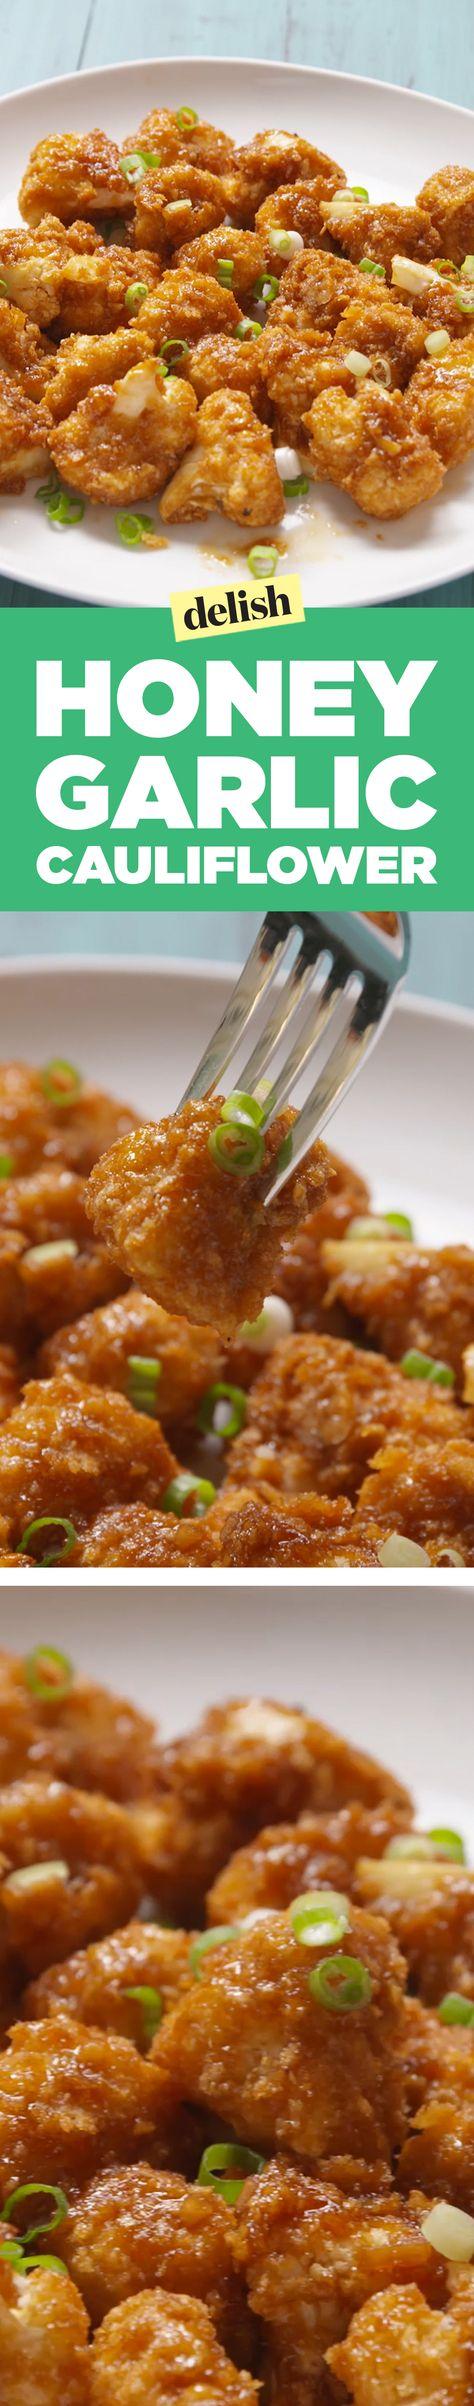 Honey garlic cauliflower is cauliflower being its best self. Get the recipe on Delish.com.